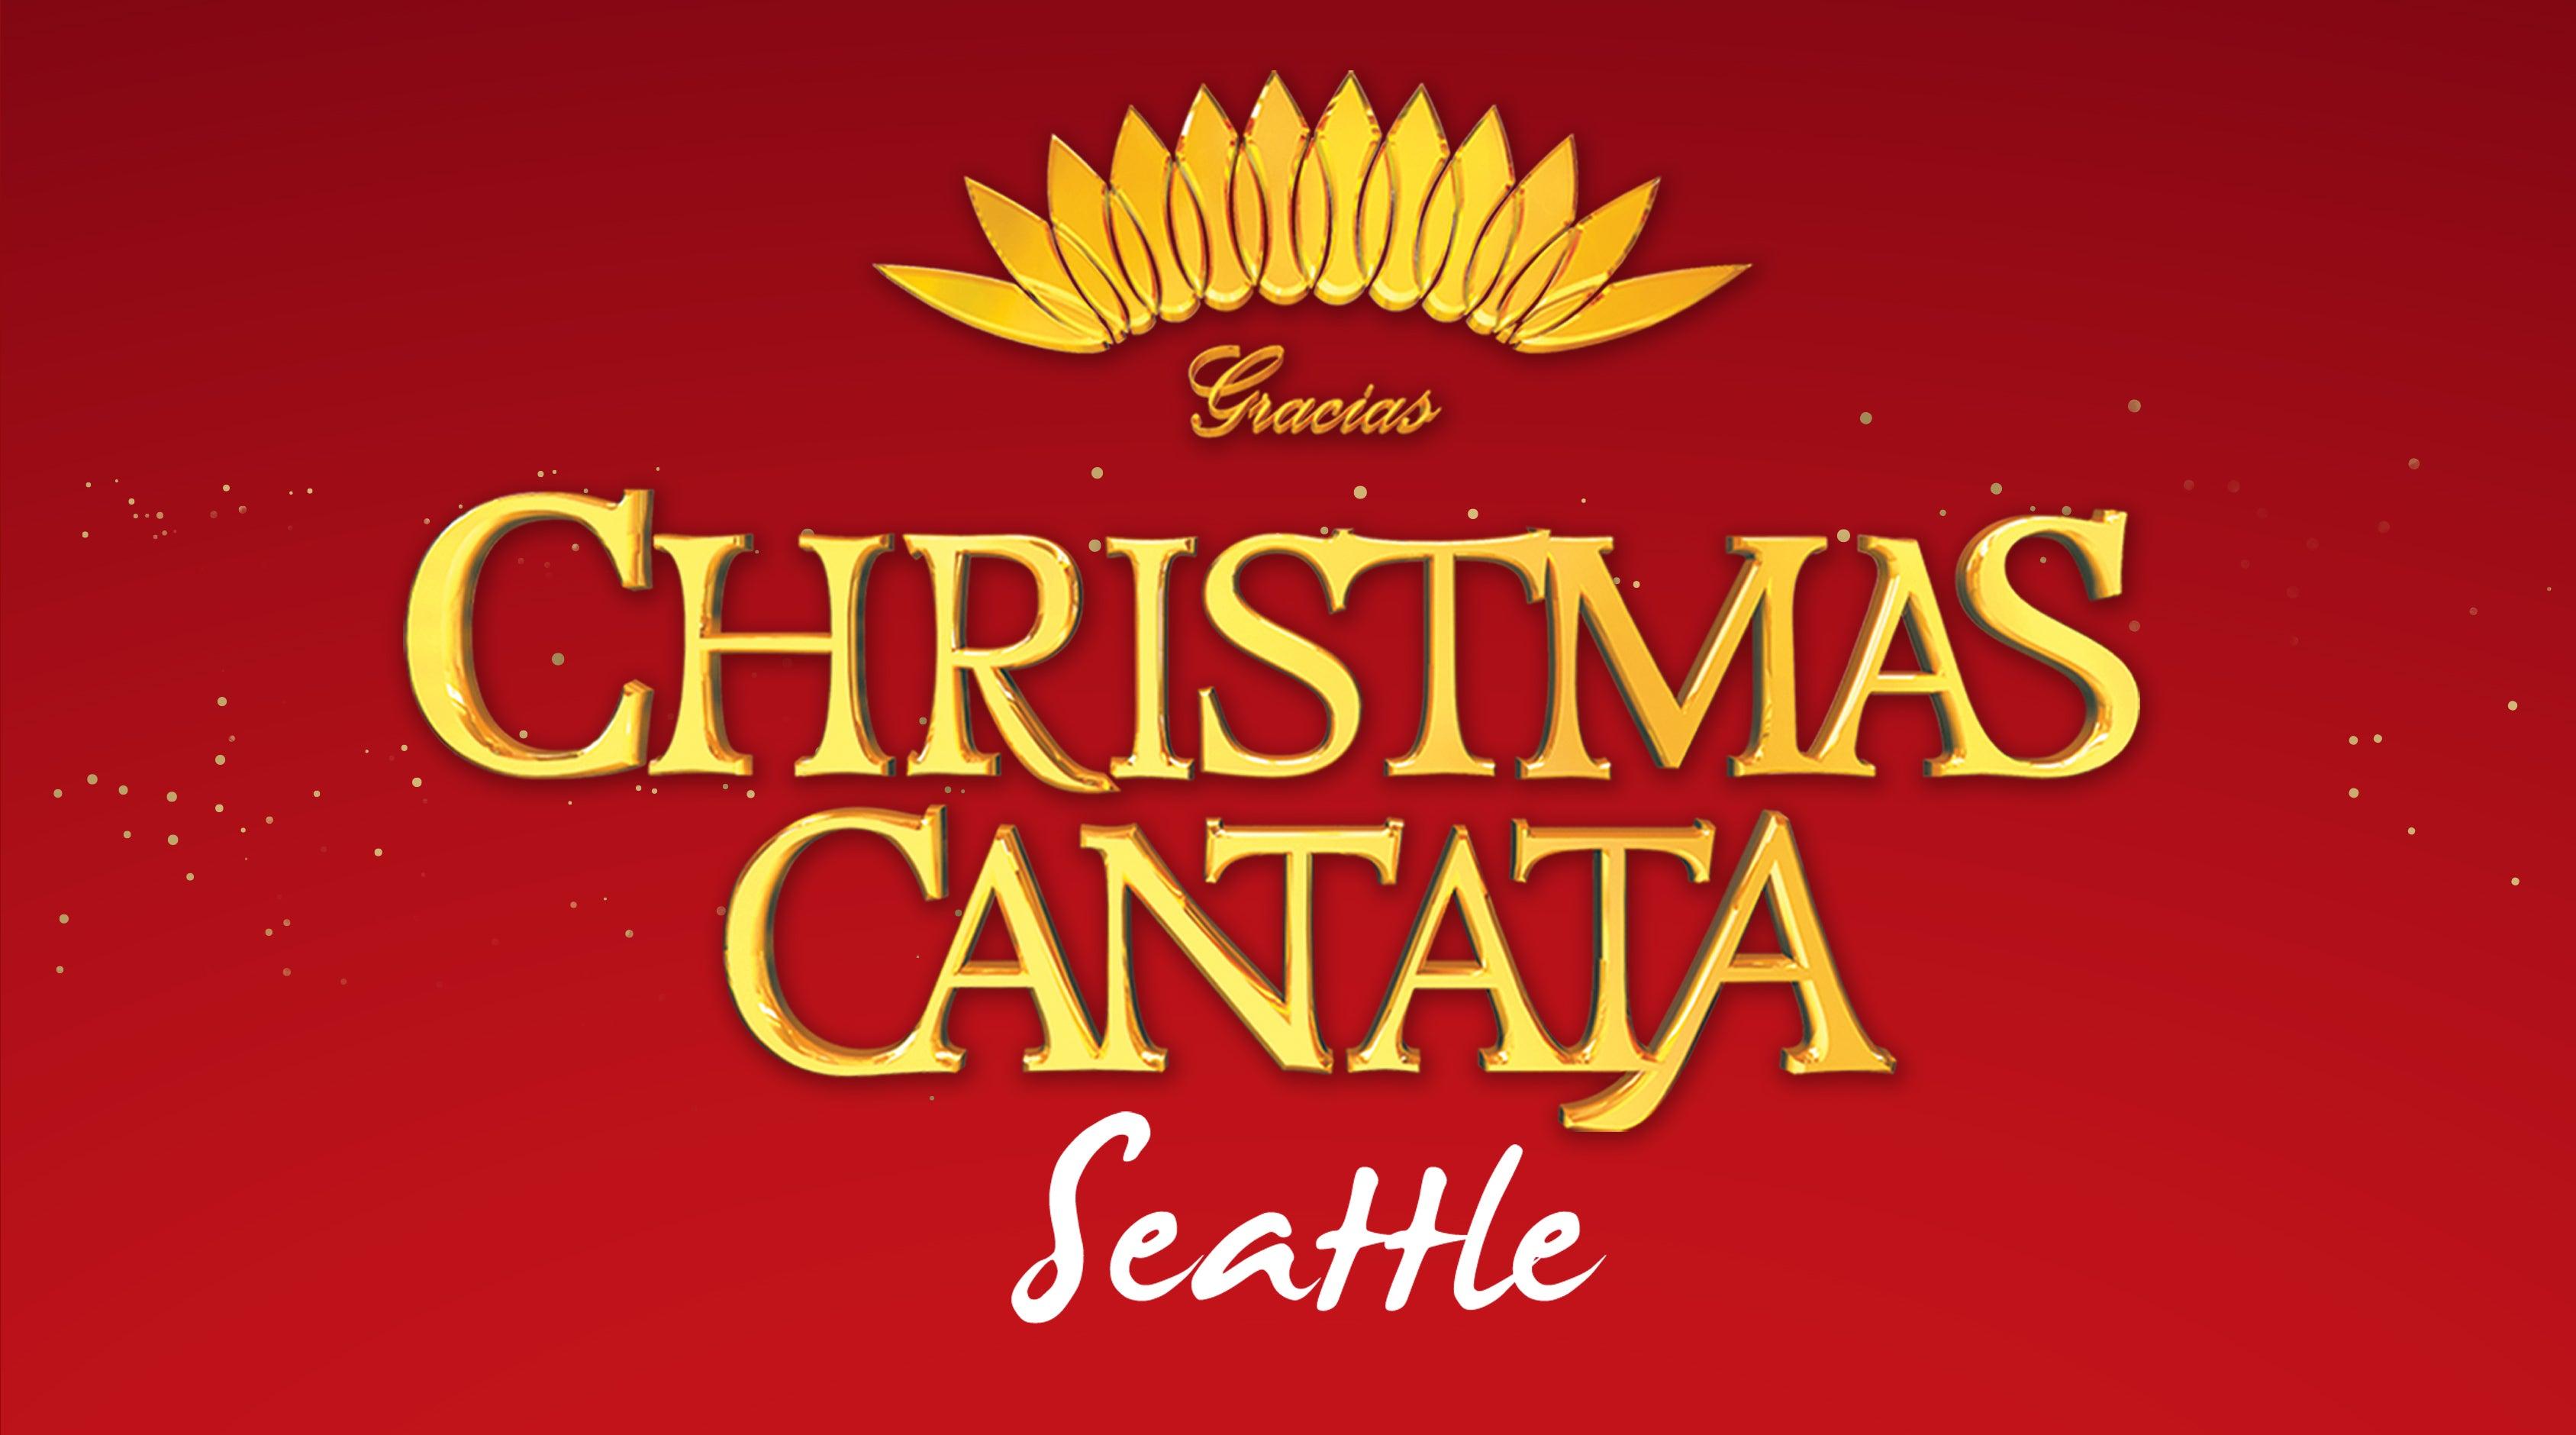 gracias christmas cantata - What Is A Christmas Cantata